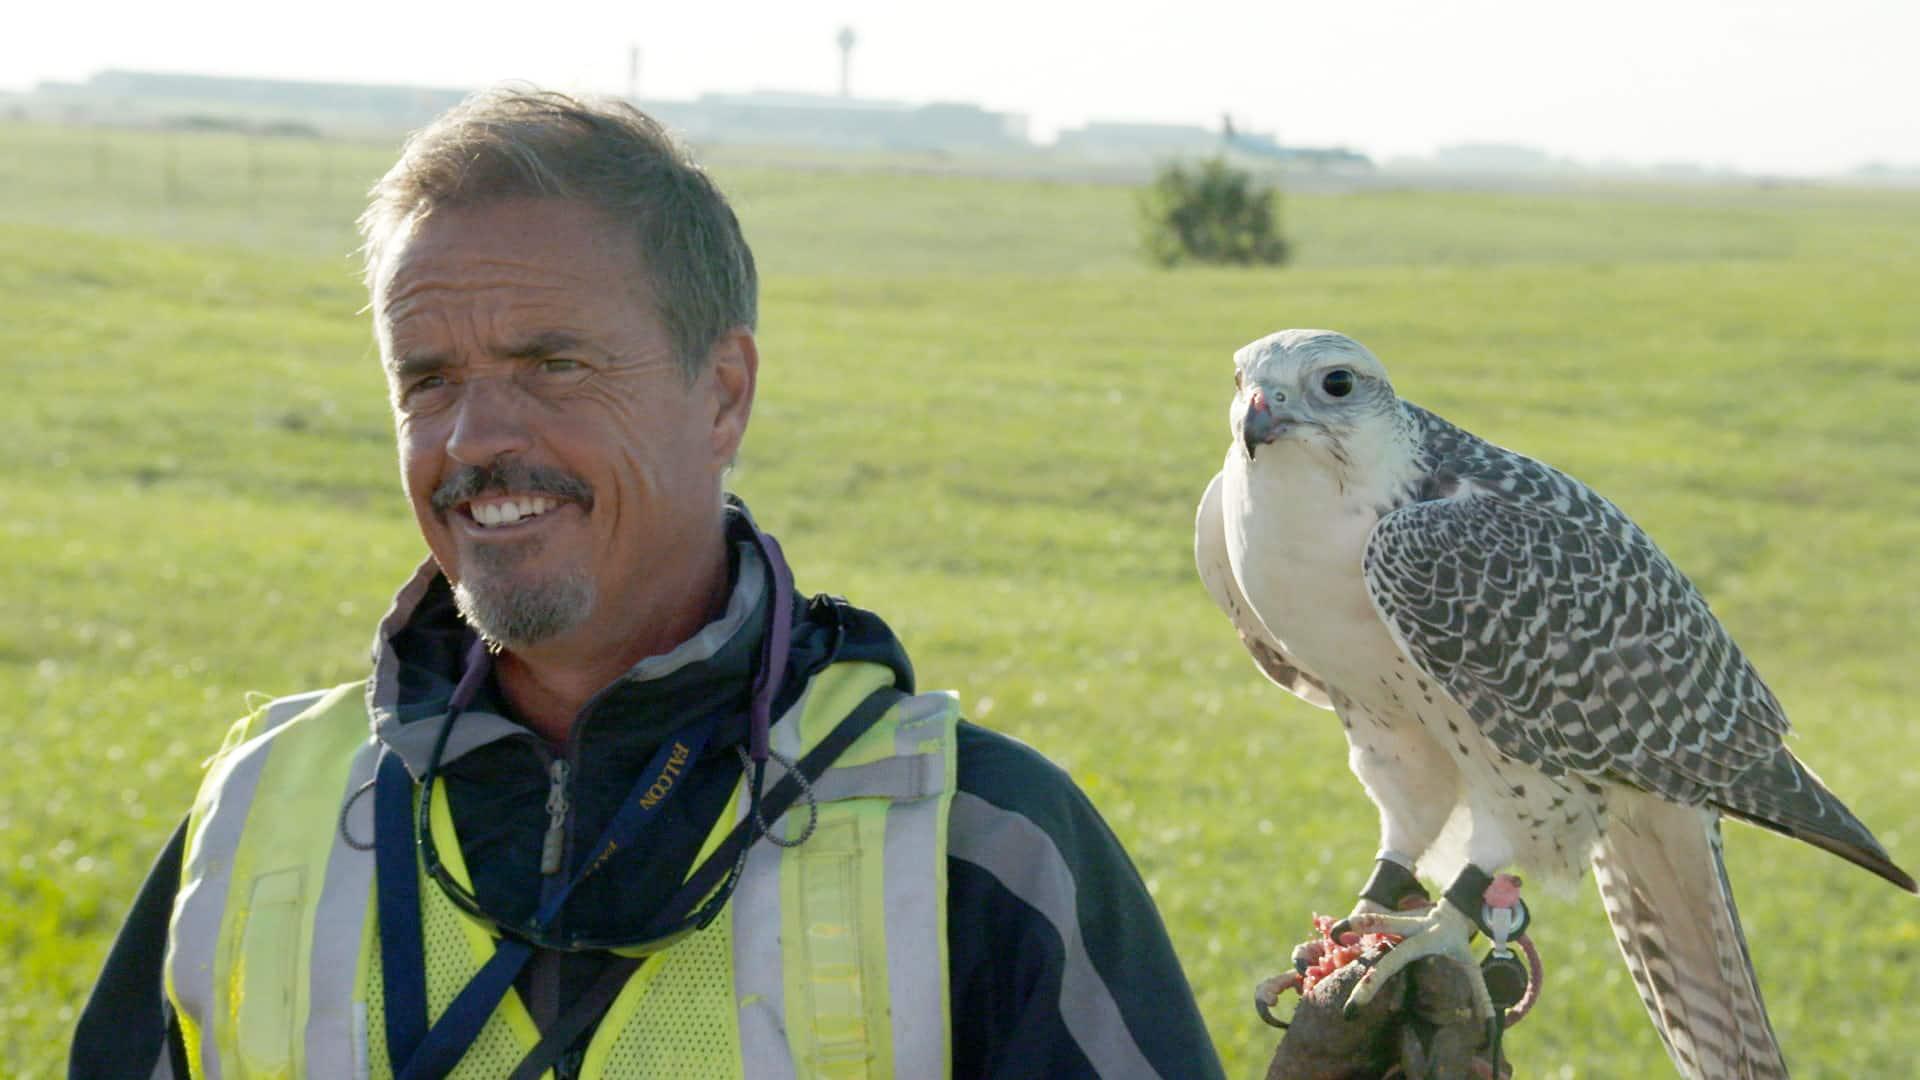 Meet Keith Everett: Falconer at Toronto Pearson International Airport